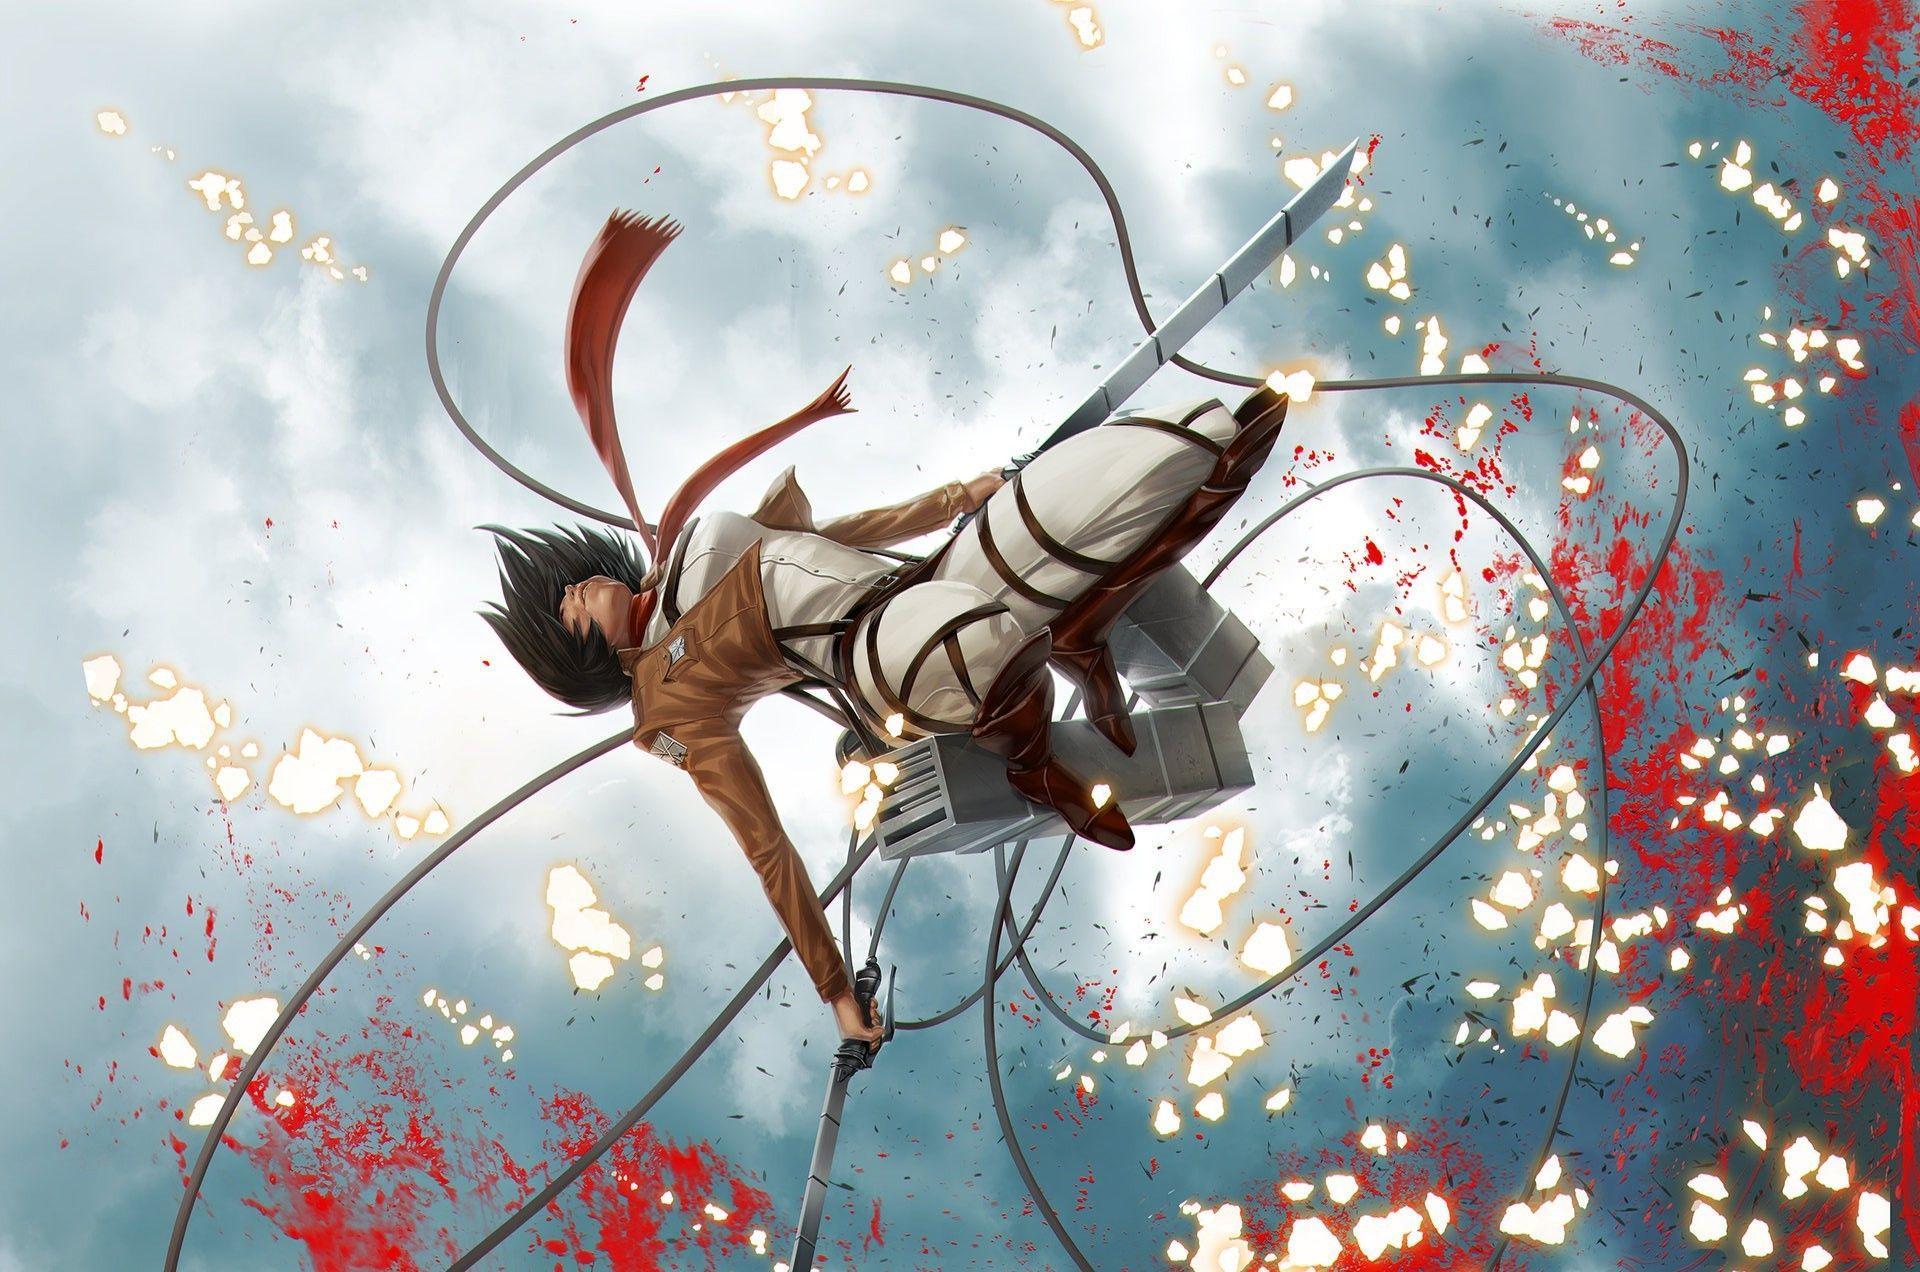 Attack On Titan Mikasa Wallpapers Top Free Attack On Titan Mikasa Backgrounds Wallpaperaccess